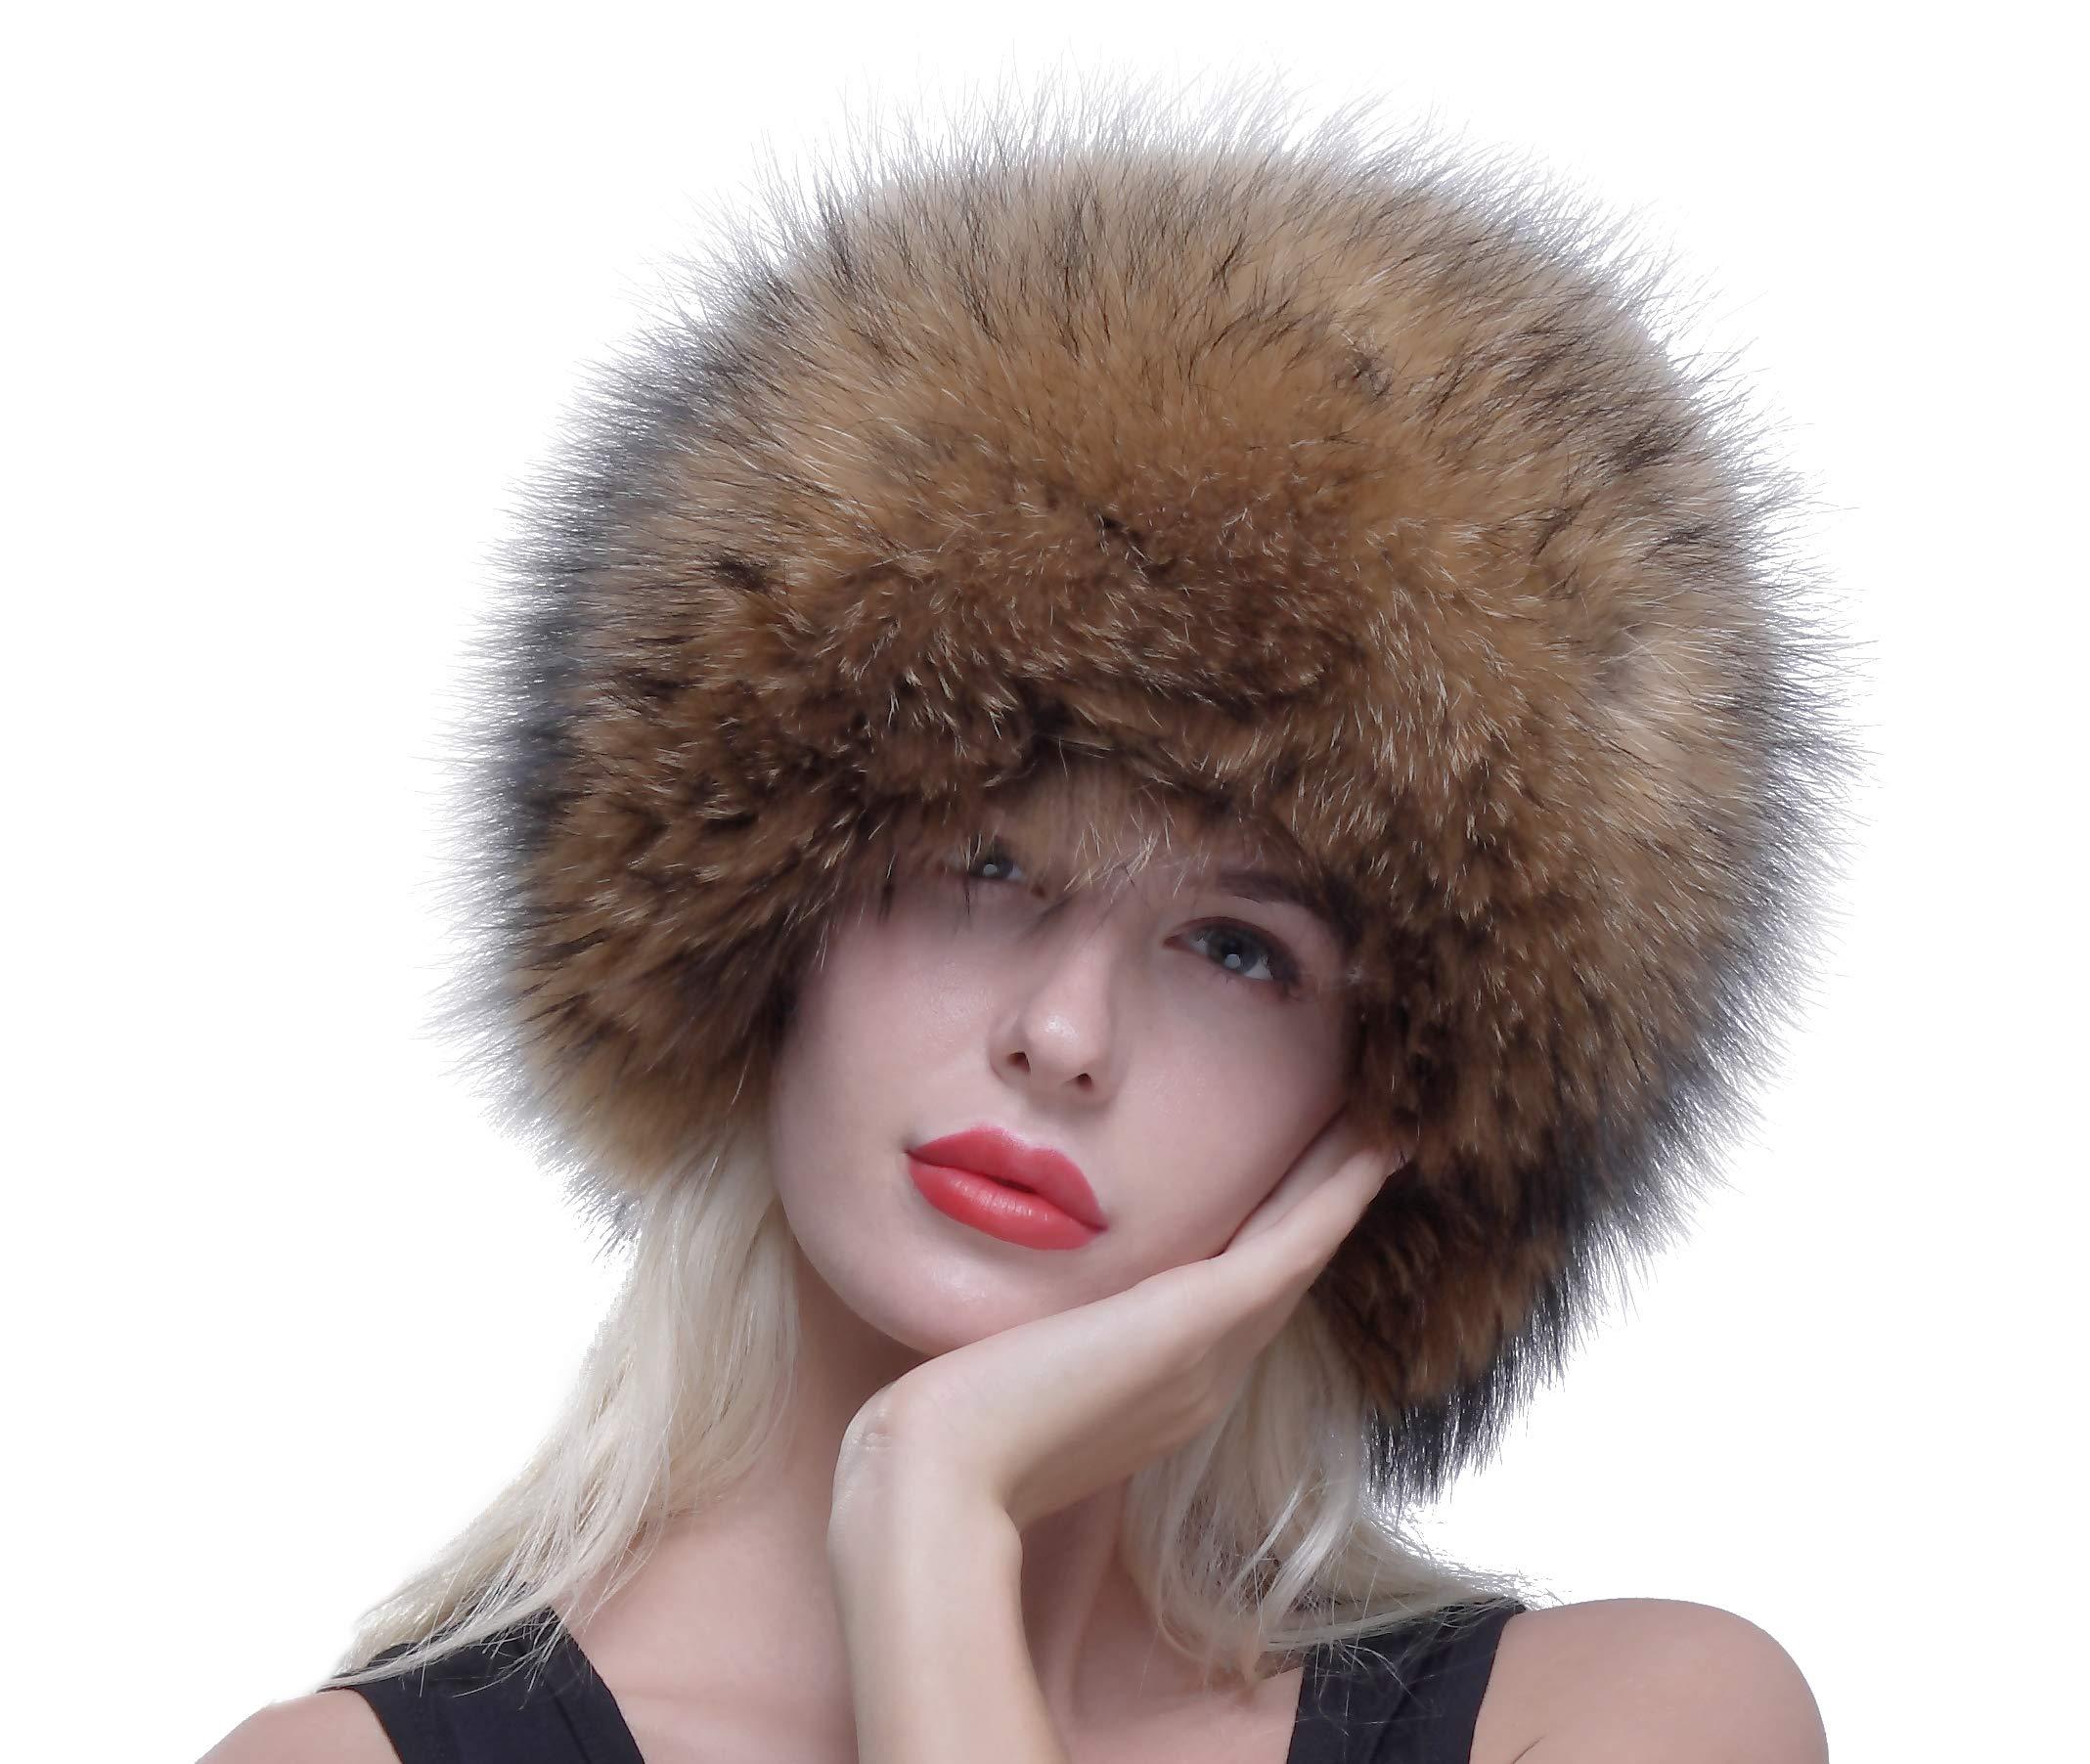 URSFUR Russian Winter Cap Real Raccoon Fur Ushanka Trapper Hat with Fur Tail by URSFUR